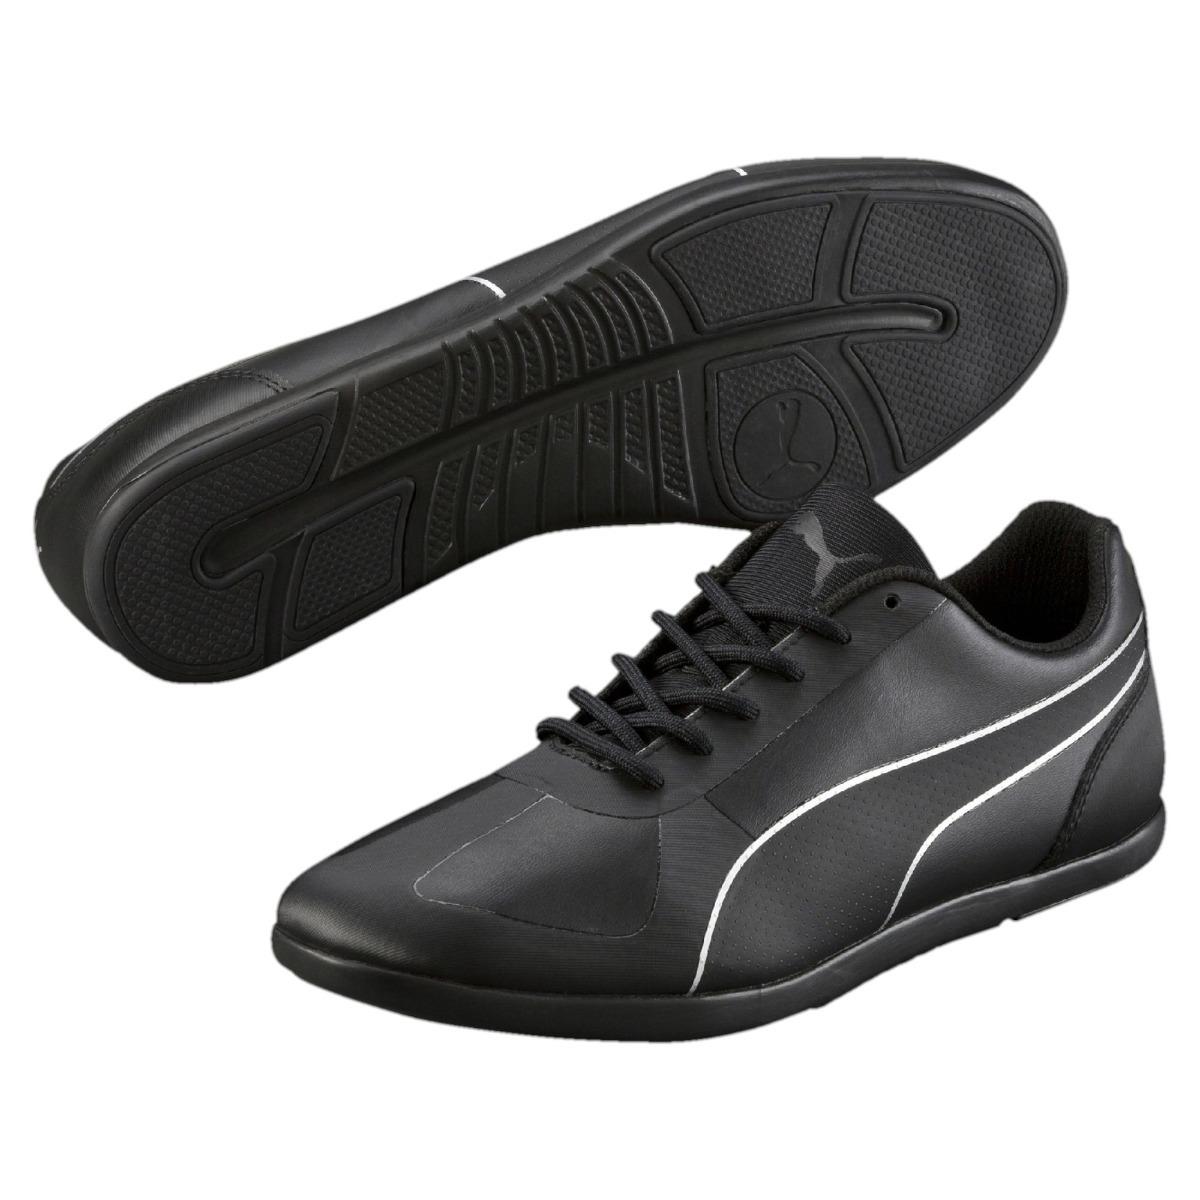 En 1 Oferta Negro Sl Modern 399 Soleil Puma Mujer 00 Zapatillas 1wq0Zv0